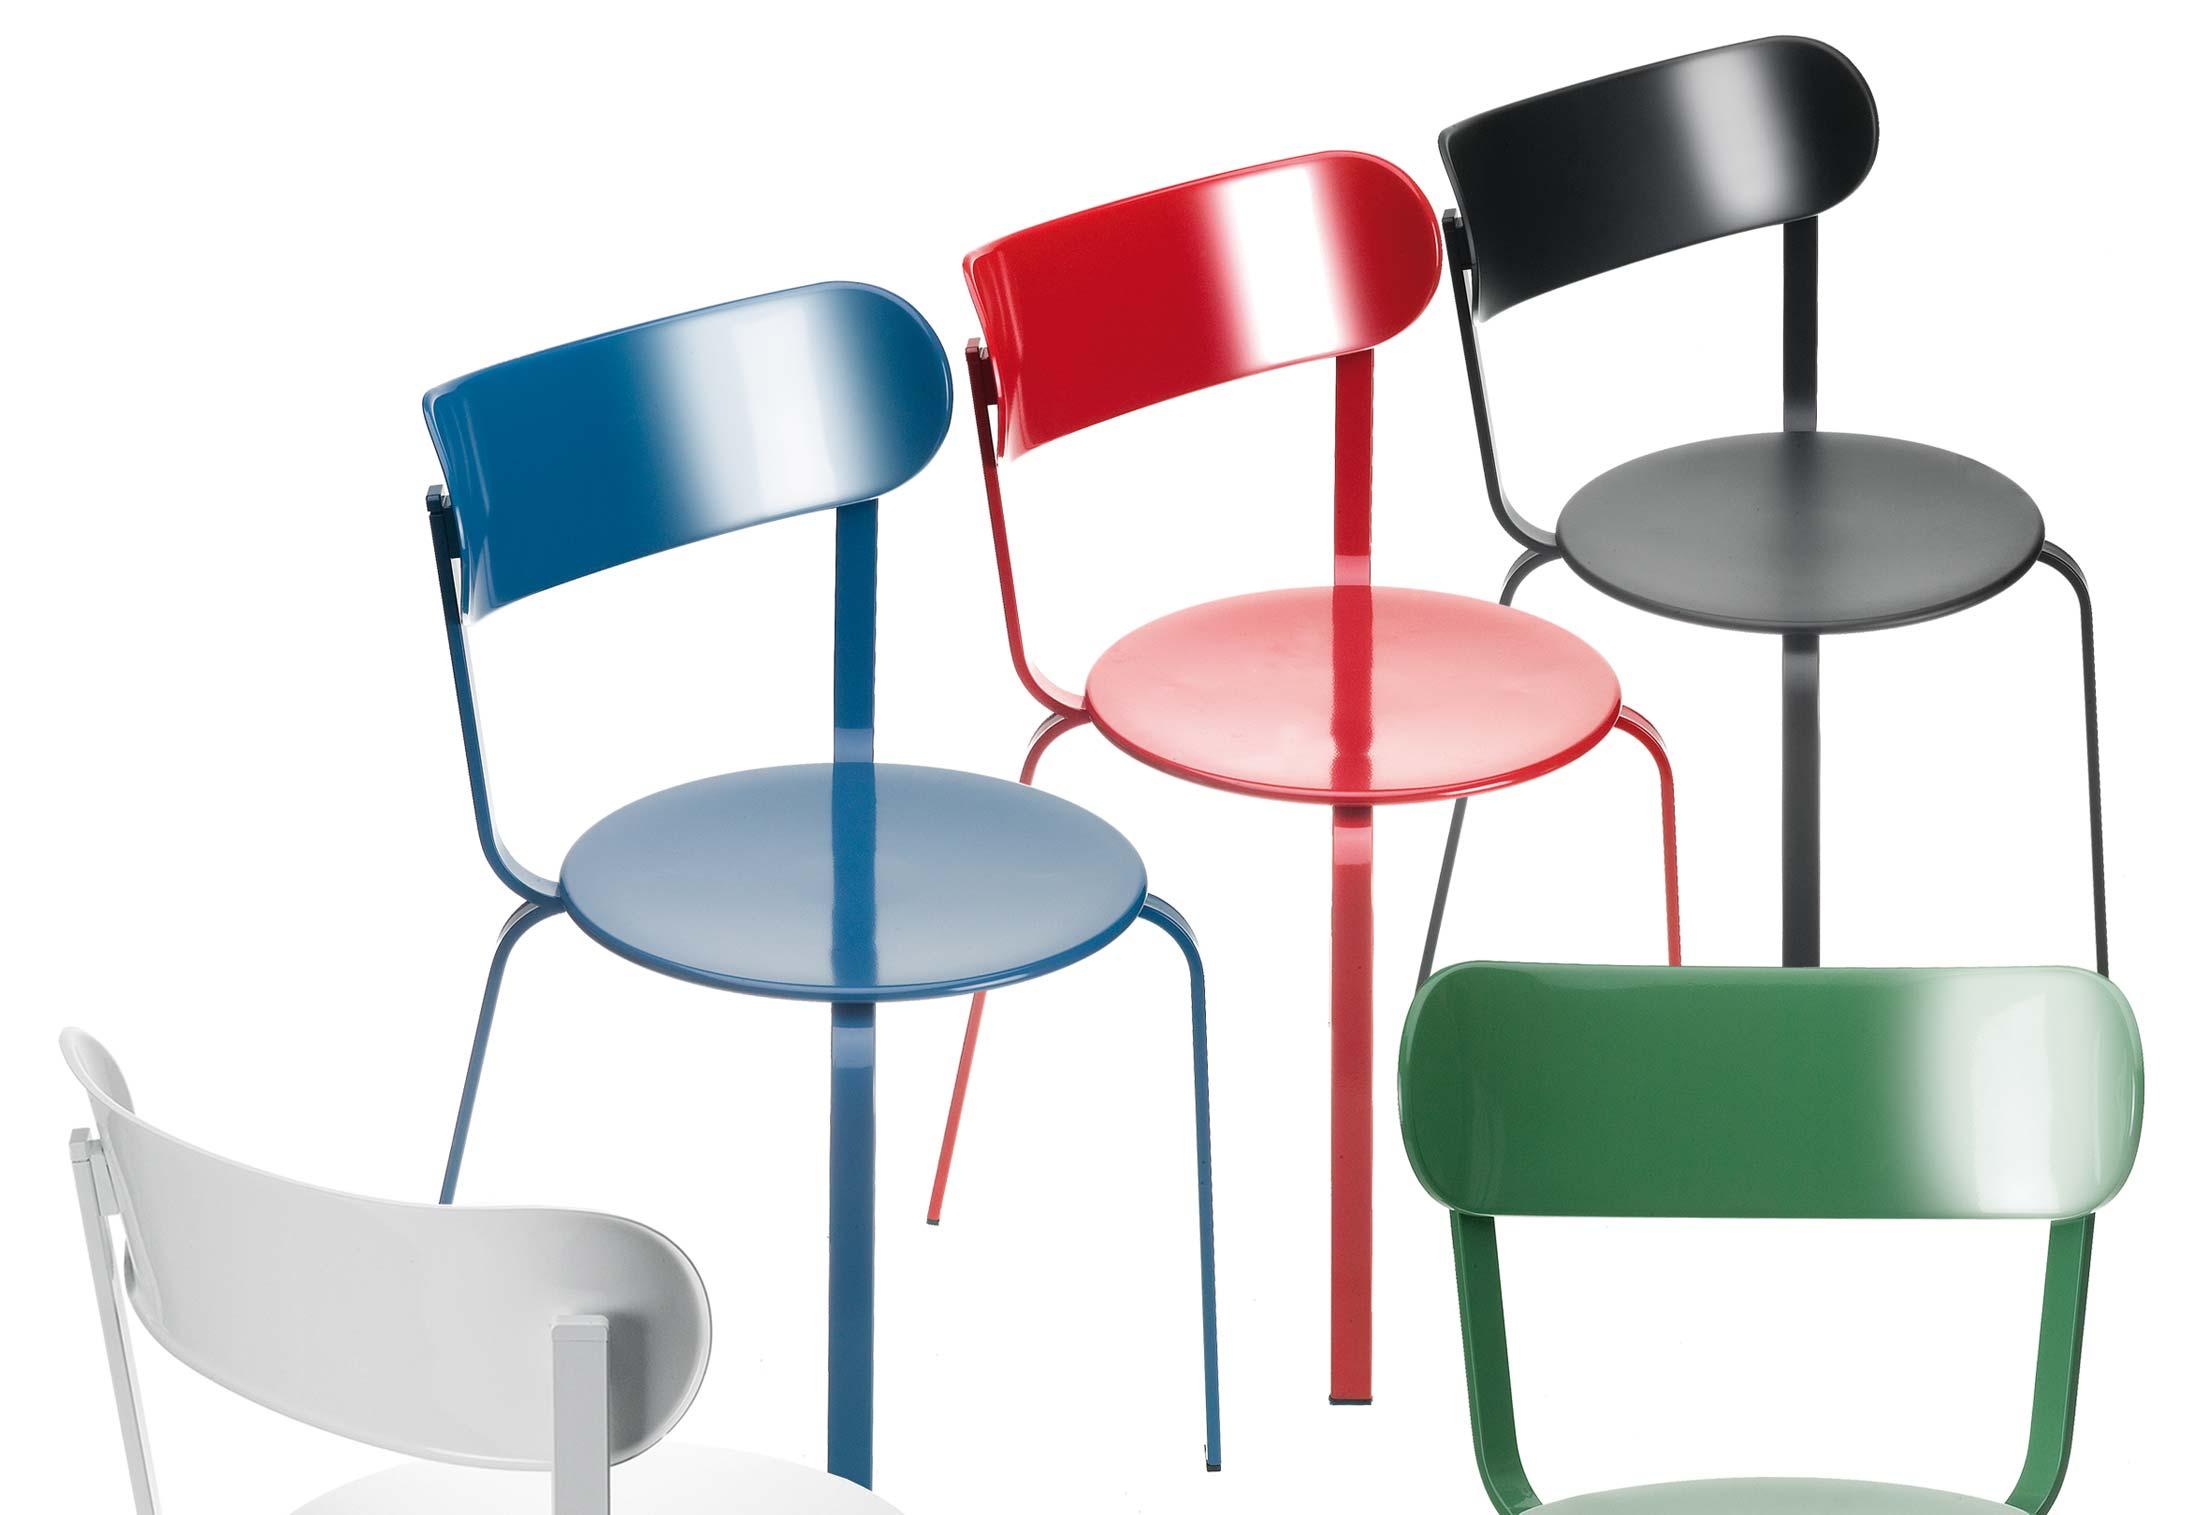 Stil stuhl von lapalma stylepark for Stuhl design entwicklung